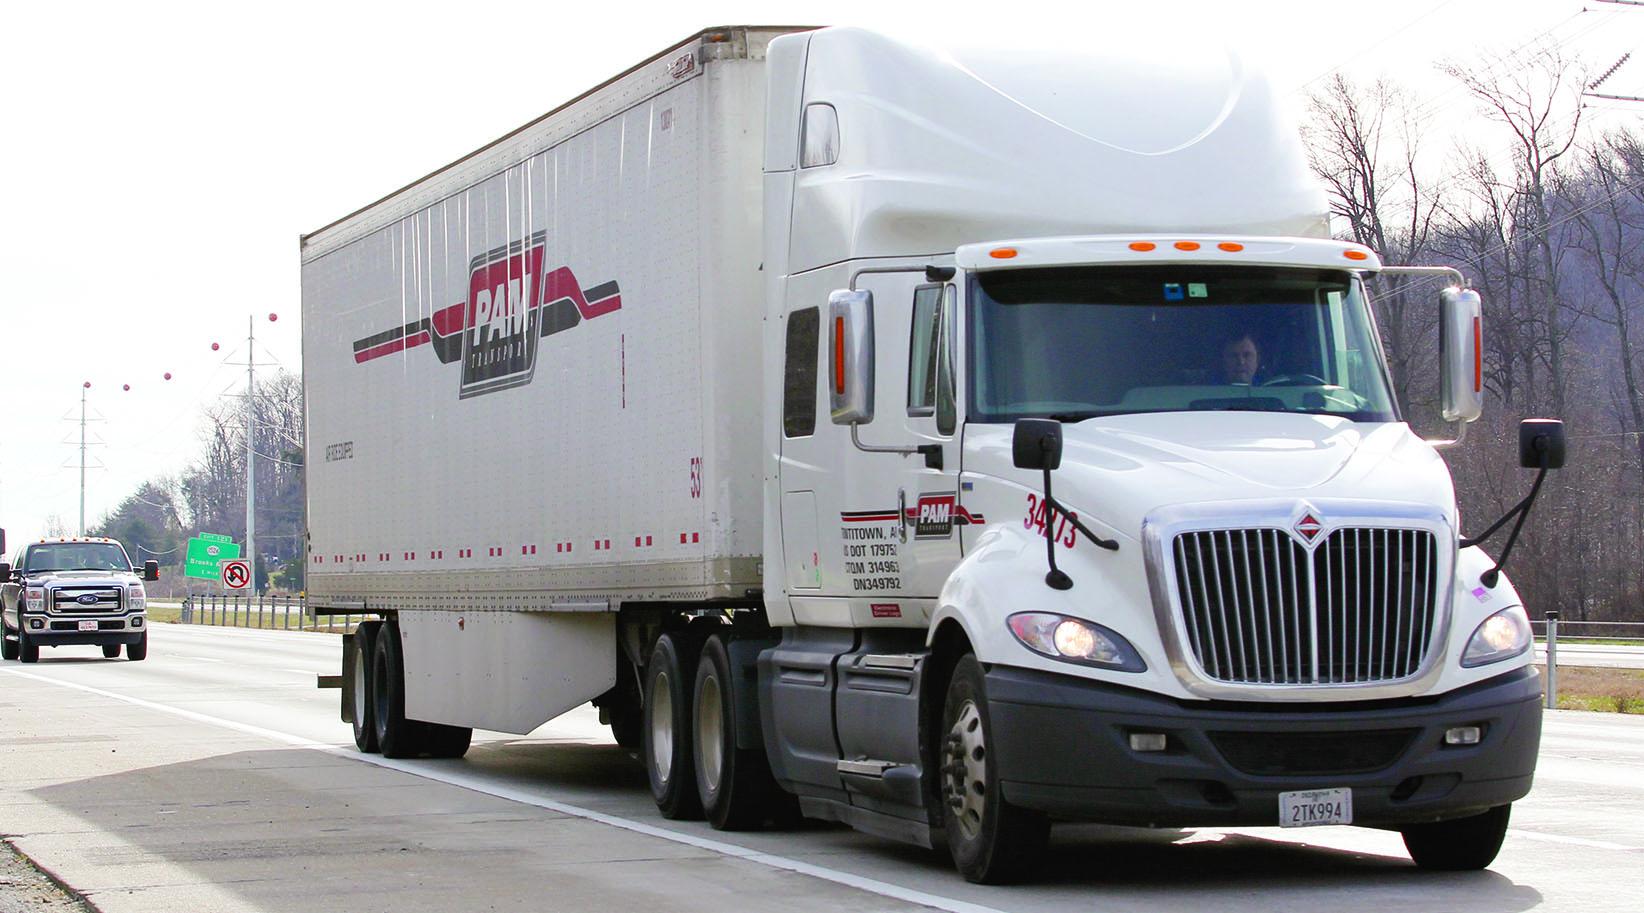 P.A.M. Transport truck